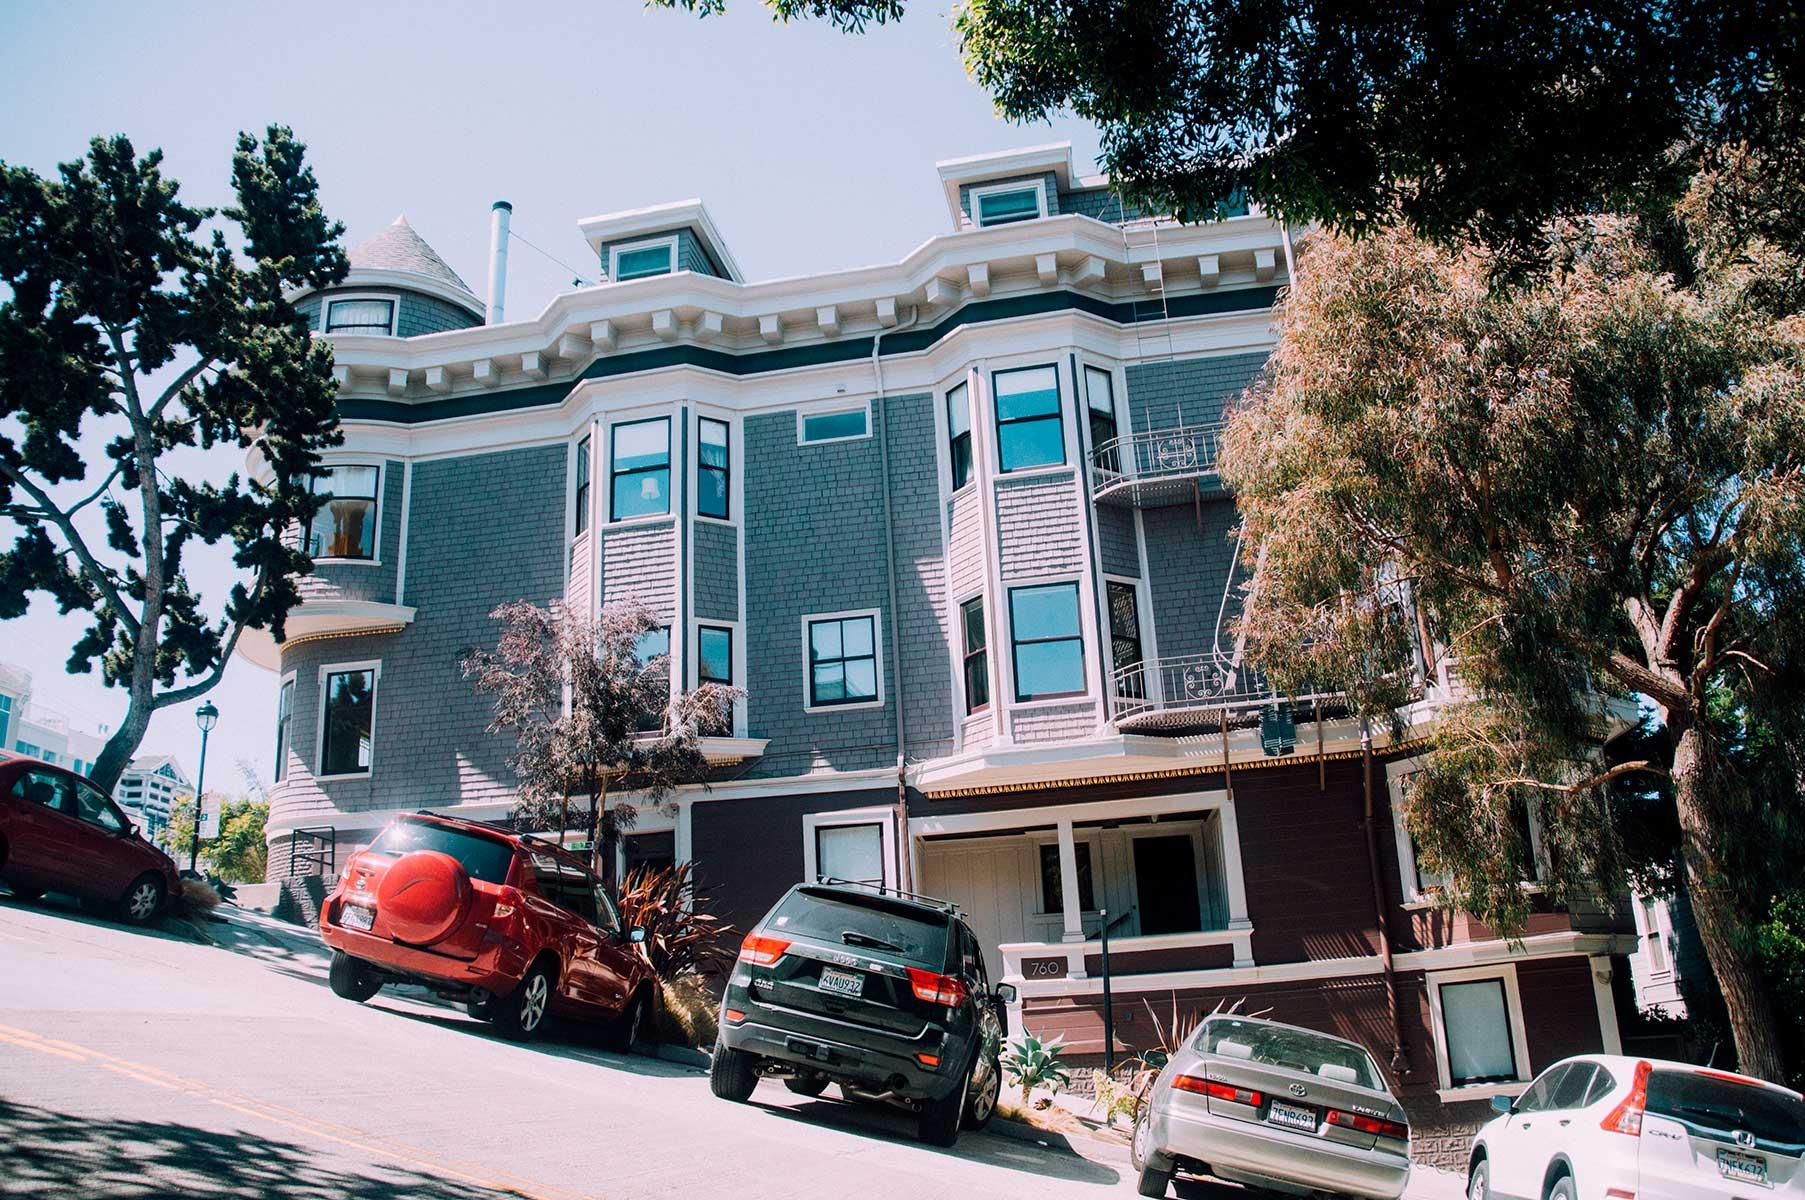 rue maison san francisco